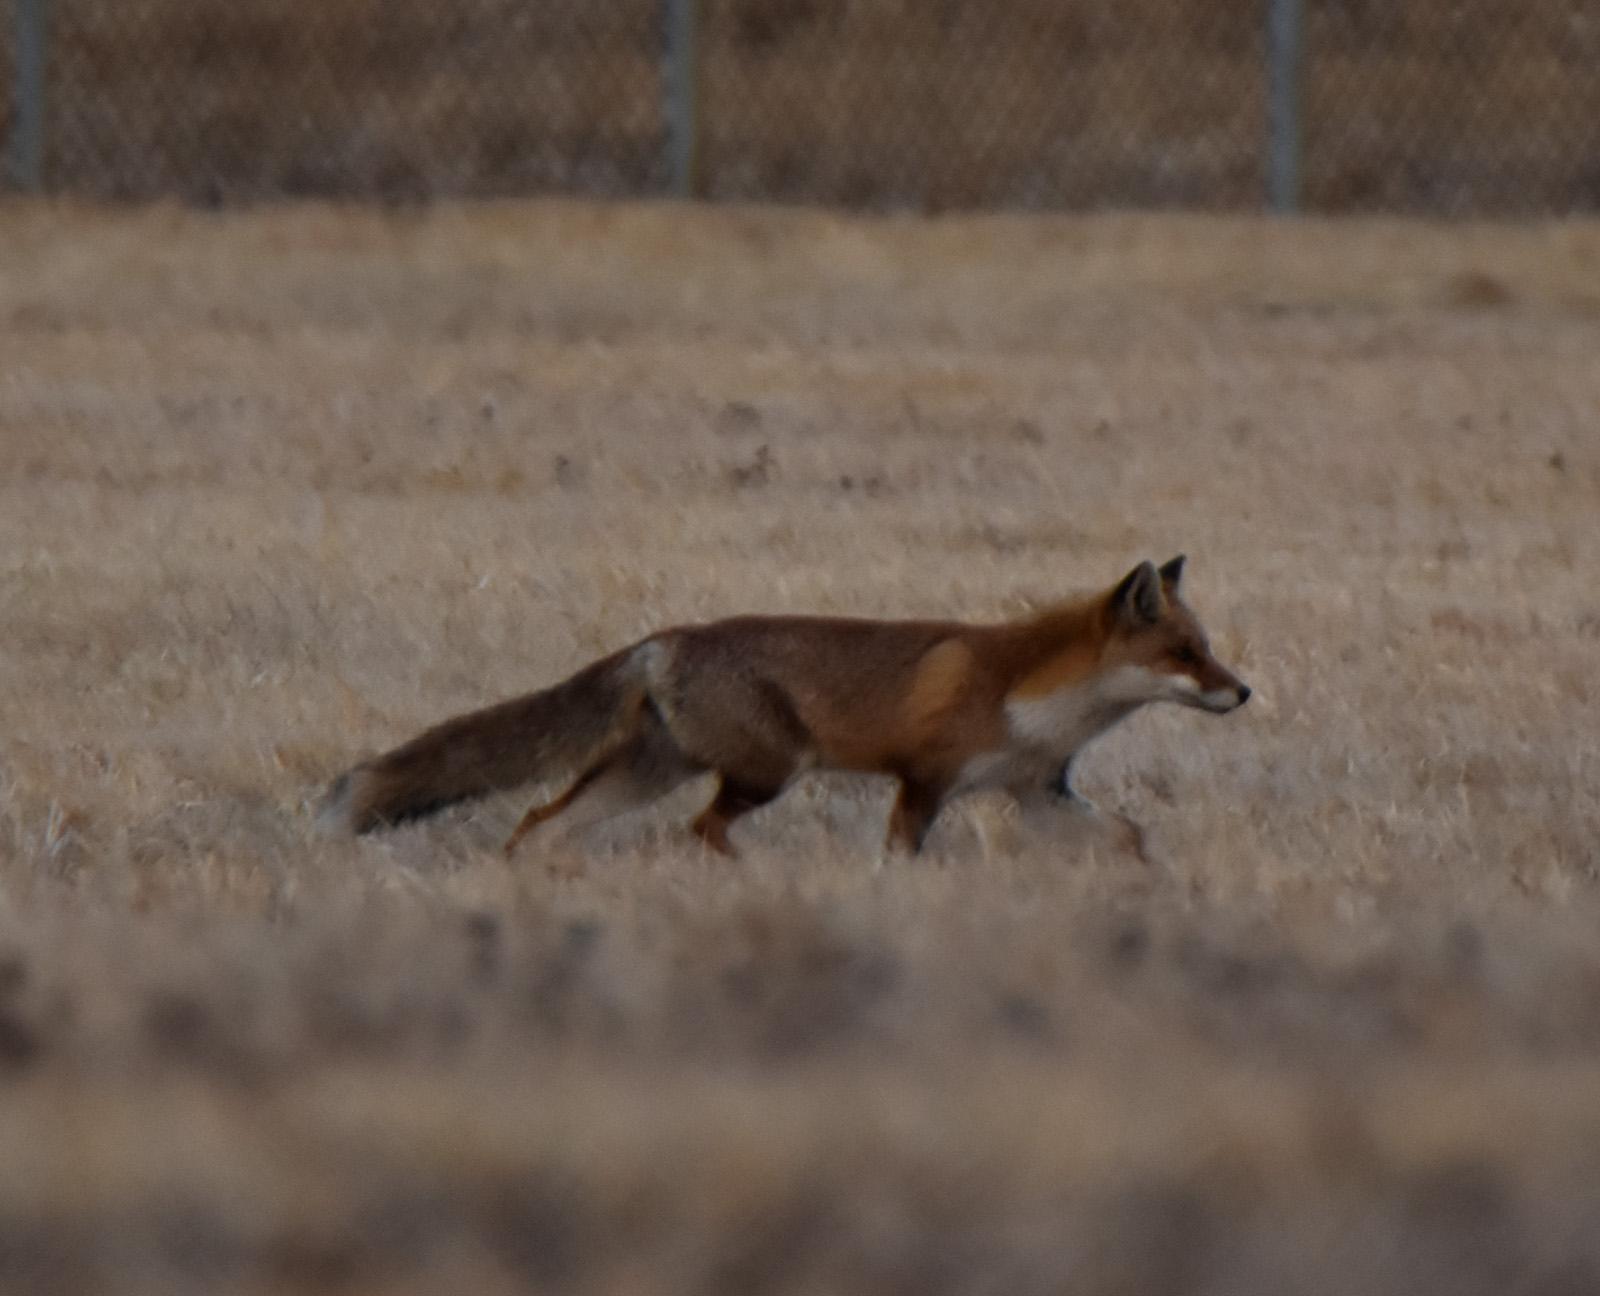 Fox170218g369